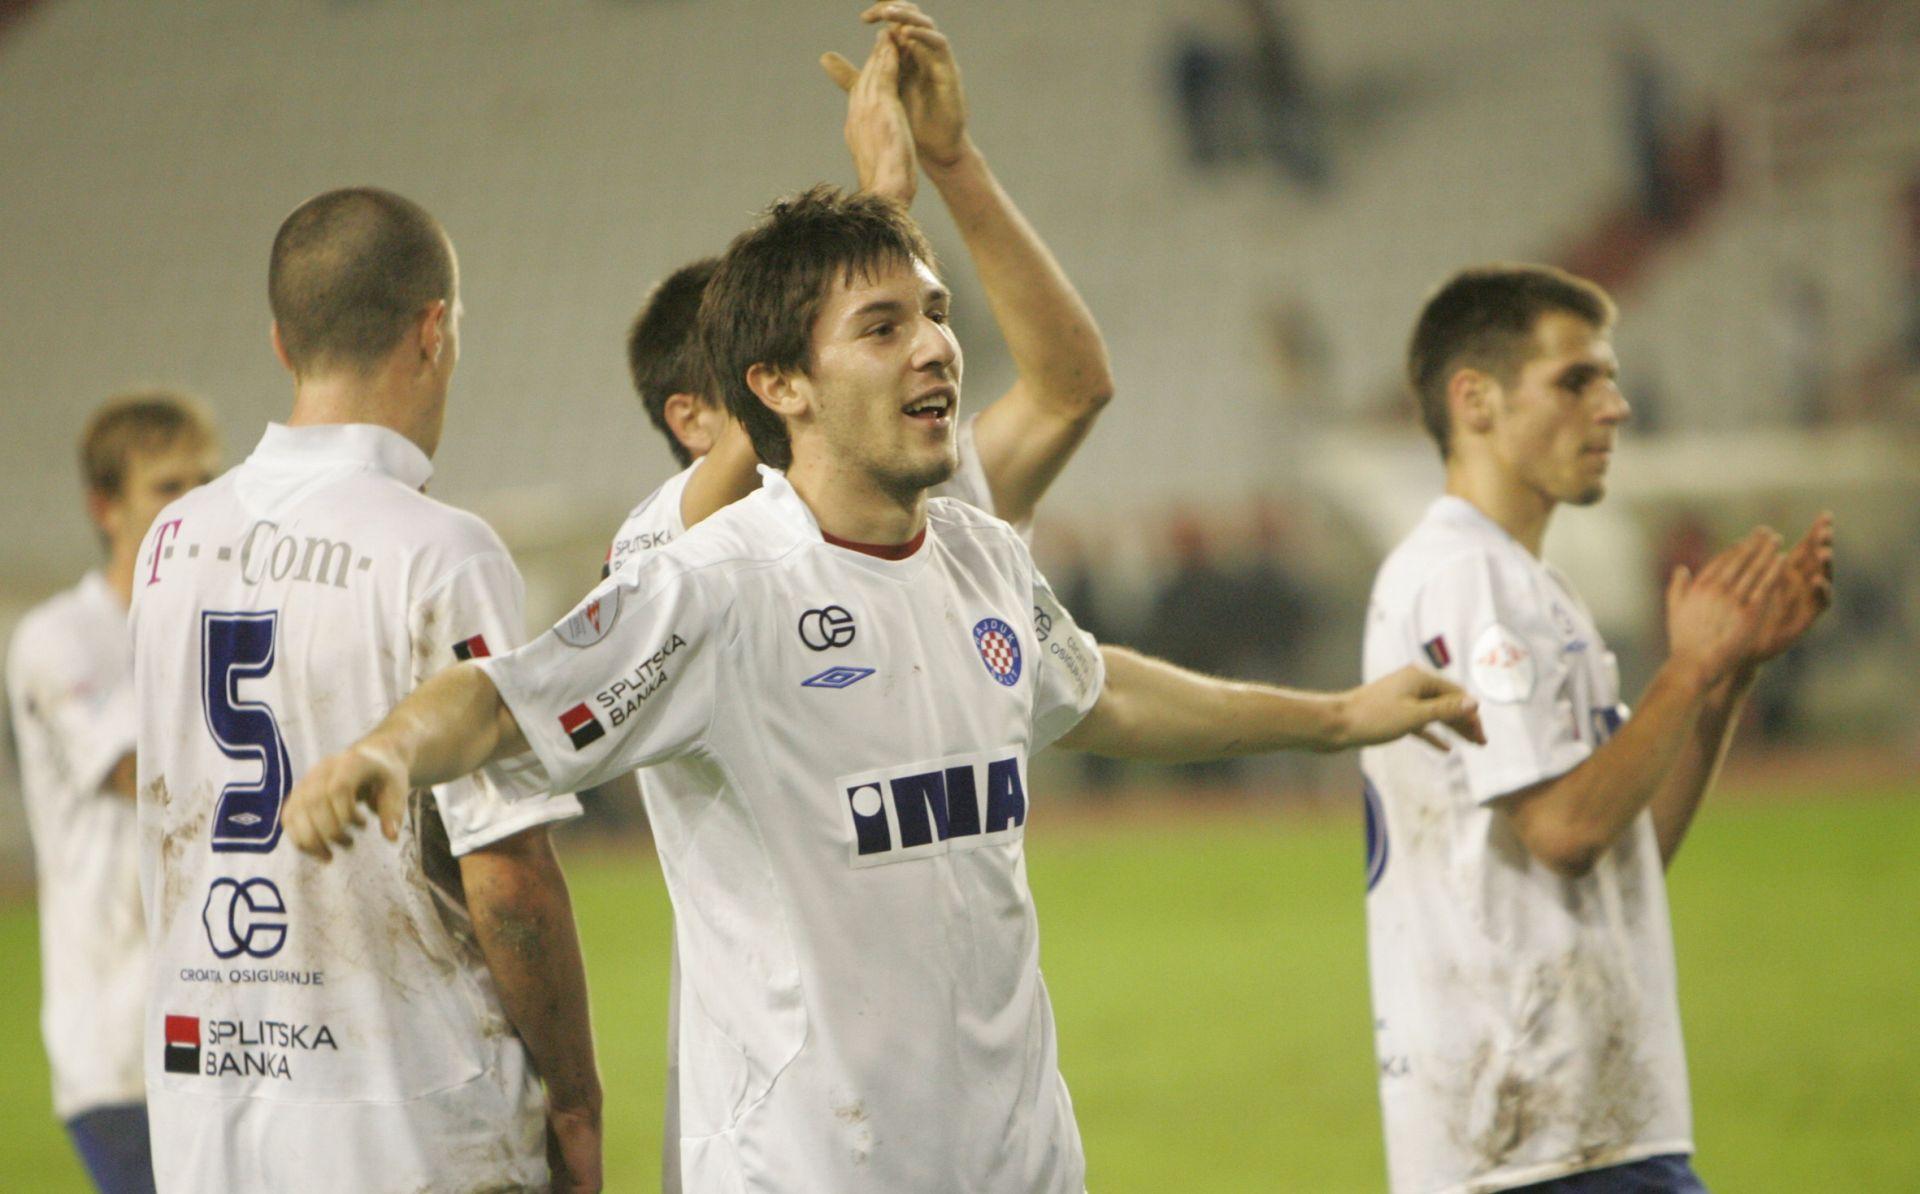 Prva HNL: Hajduk – Osijek 3-0